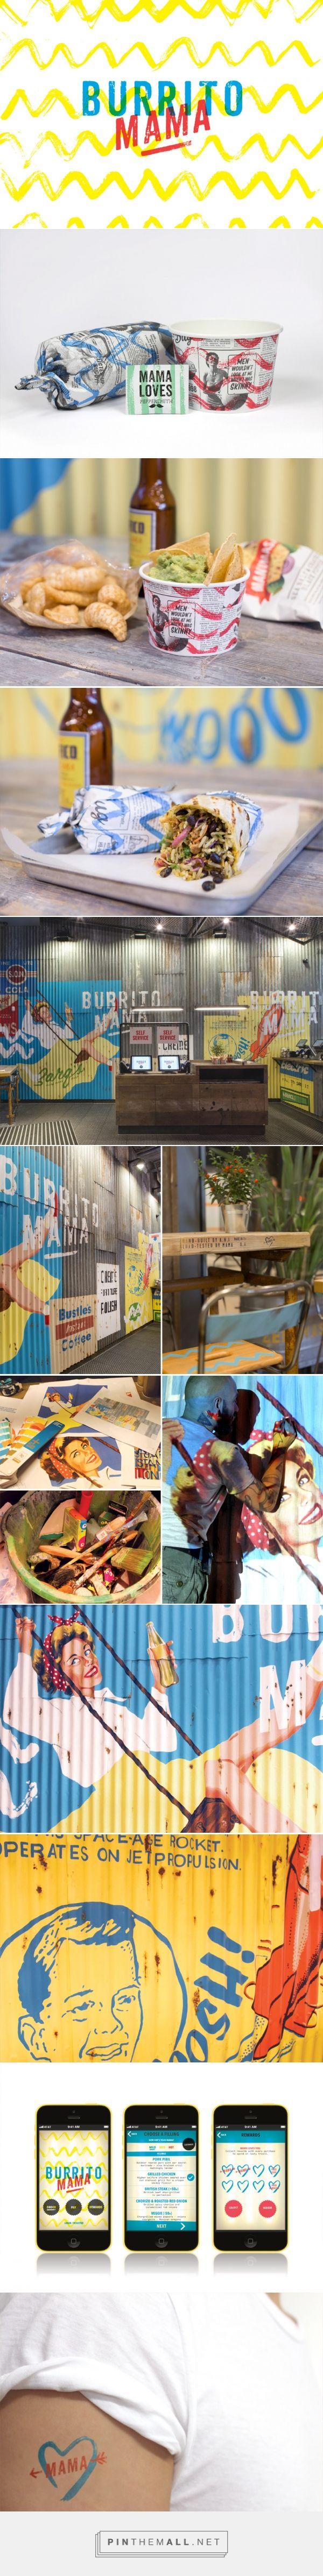 Burrito Mama Restaurant Branding by BuroCreative| Fivestar Branding Agency – Design and Branding Agency & Curated Inspiration Gallery